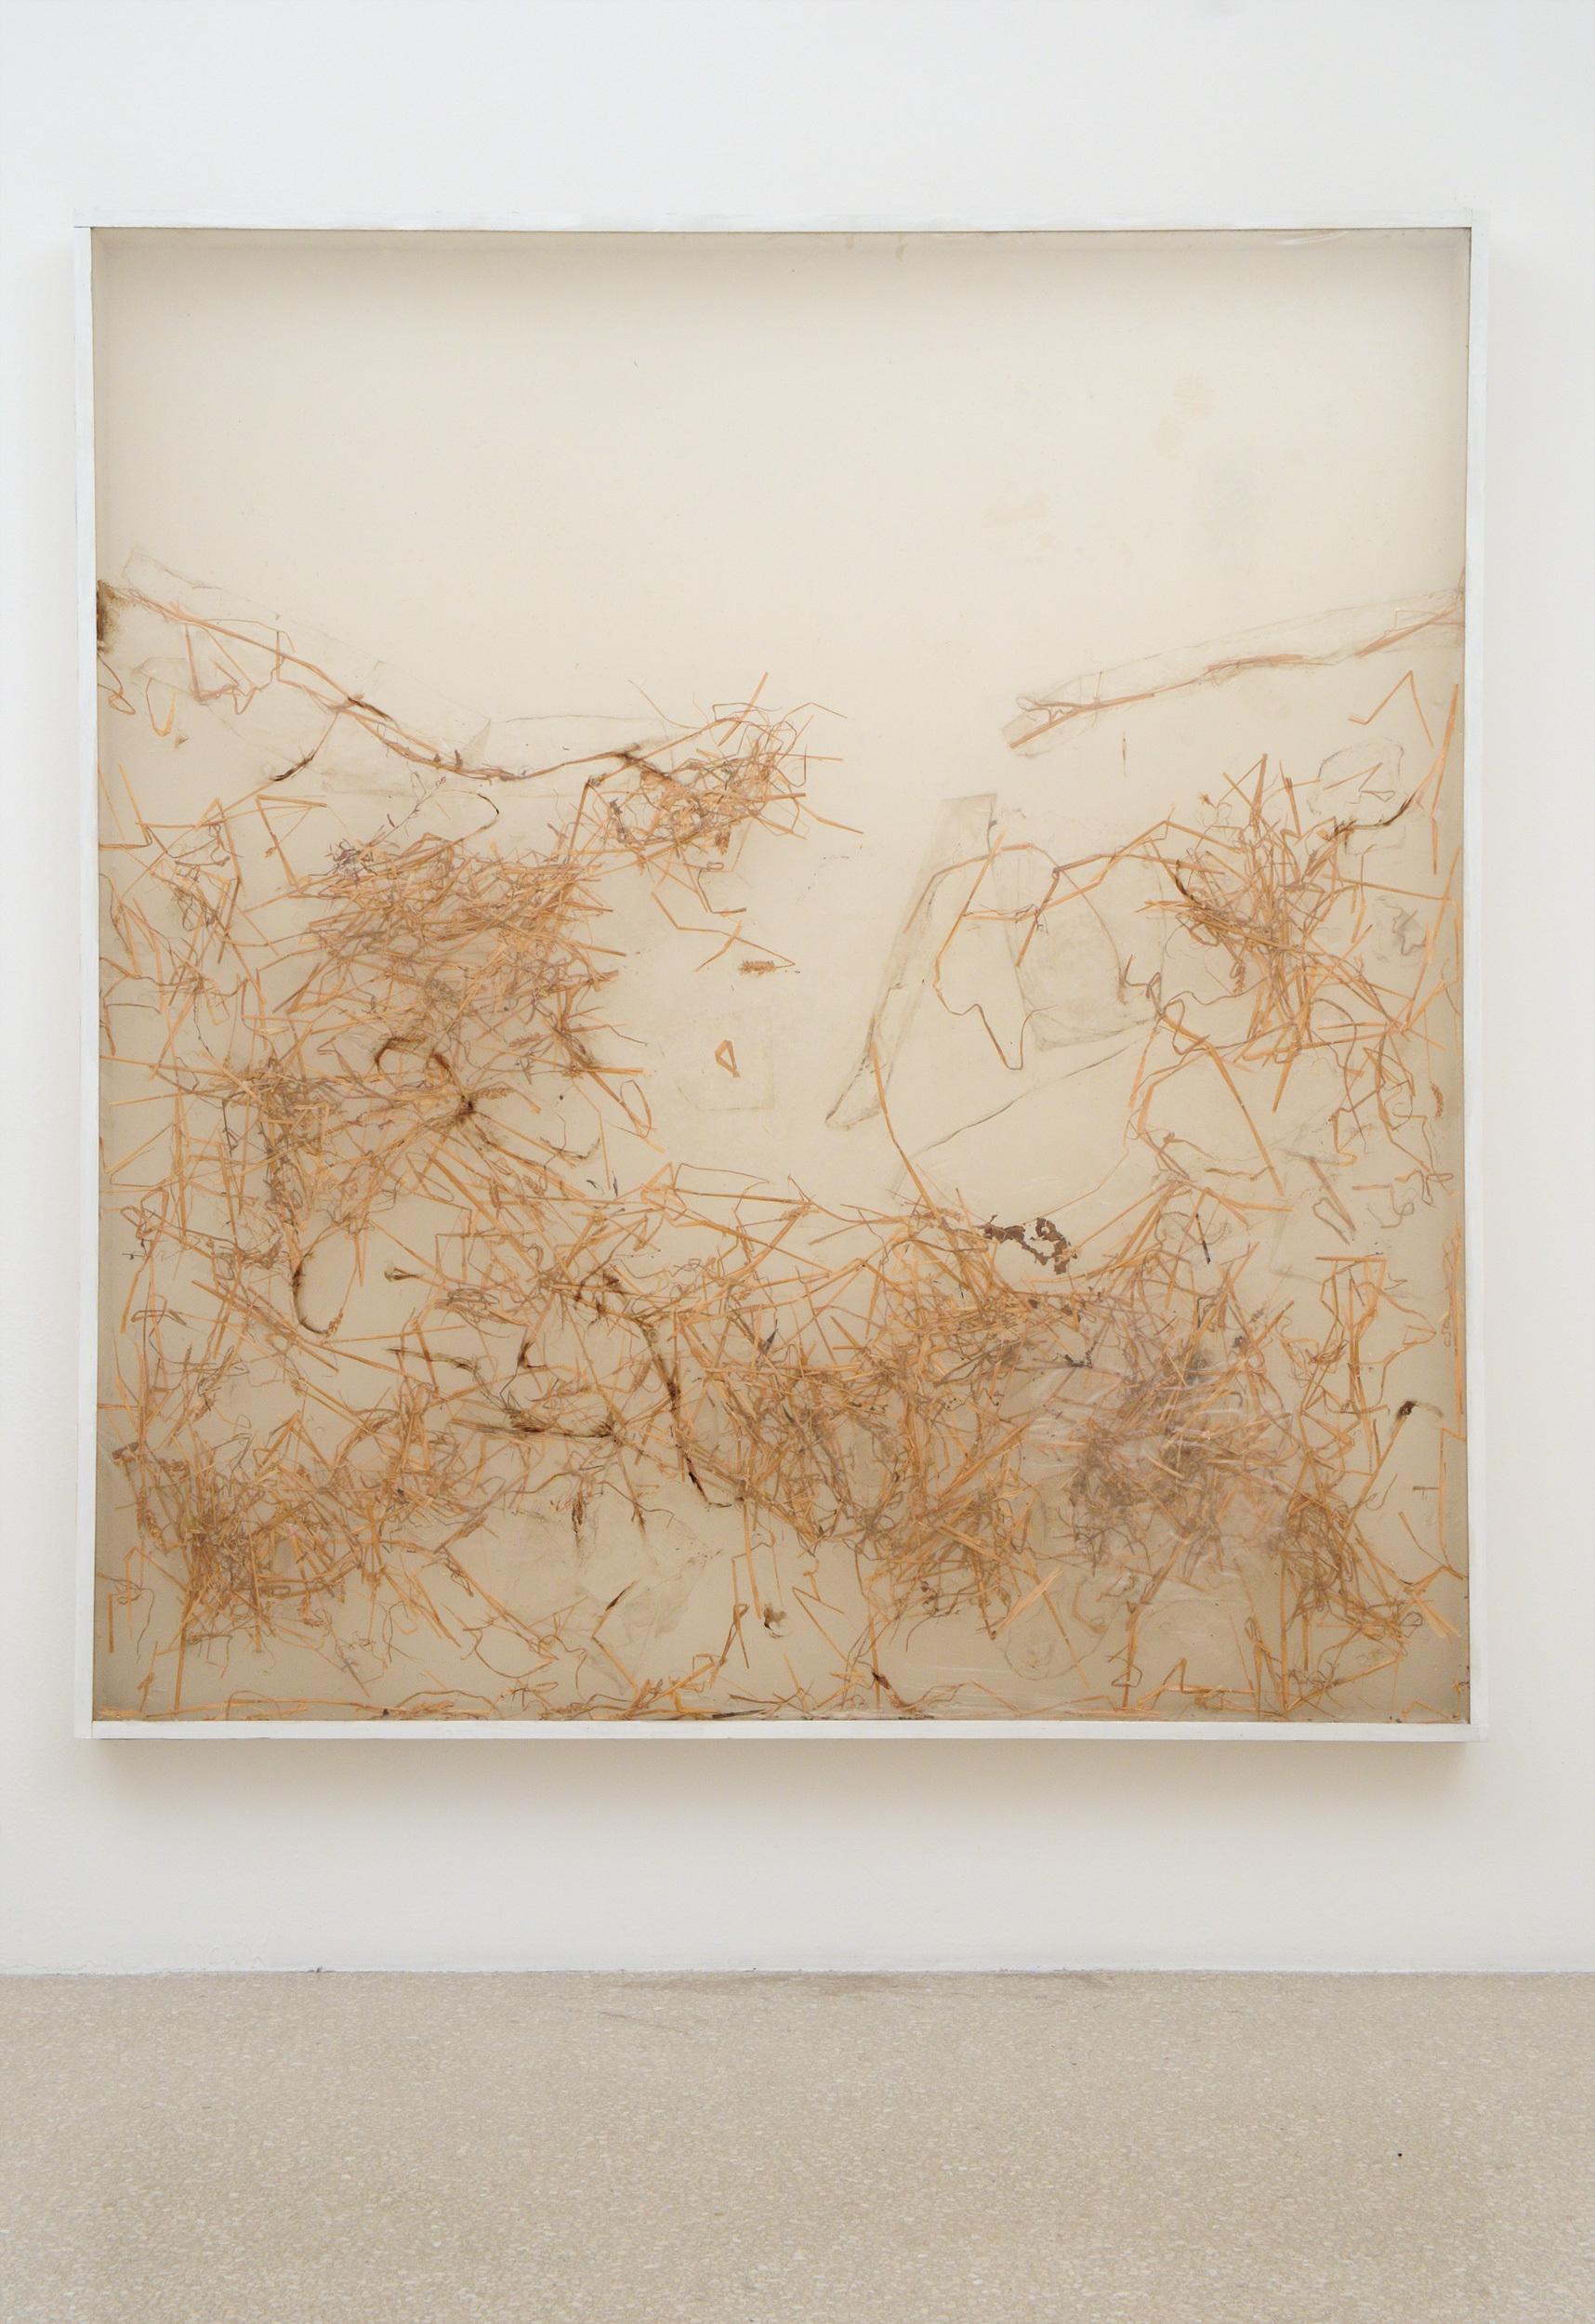 Germano sartelli mostra galleria de foscherari bologna.jpg